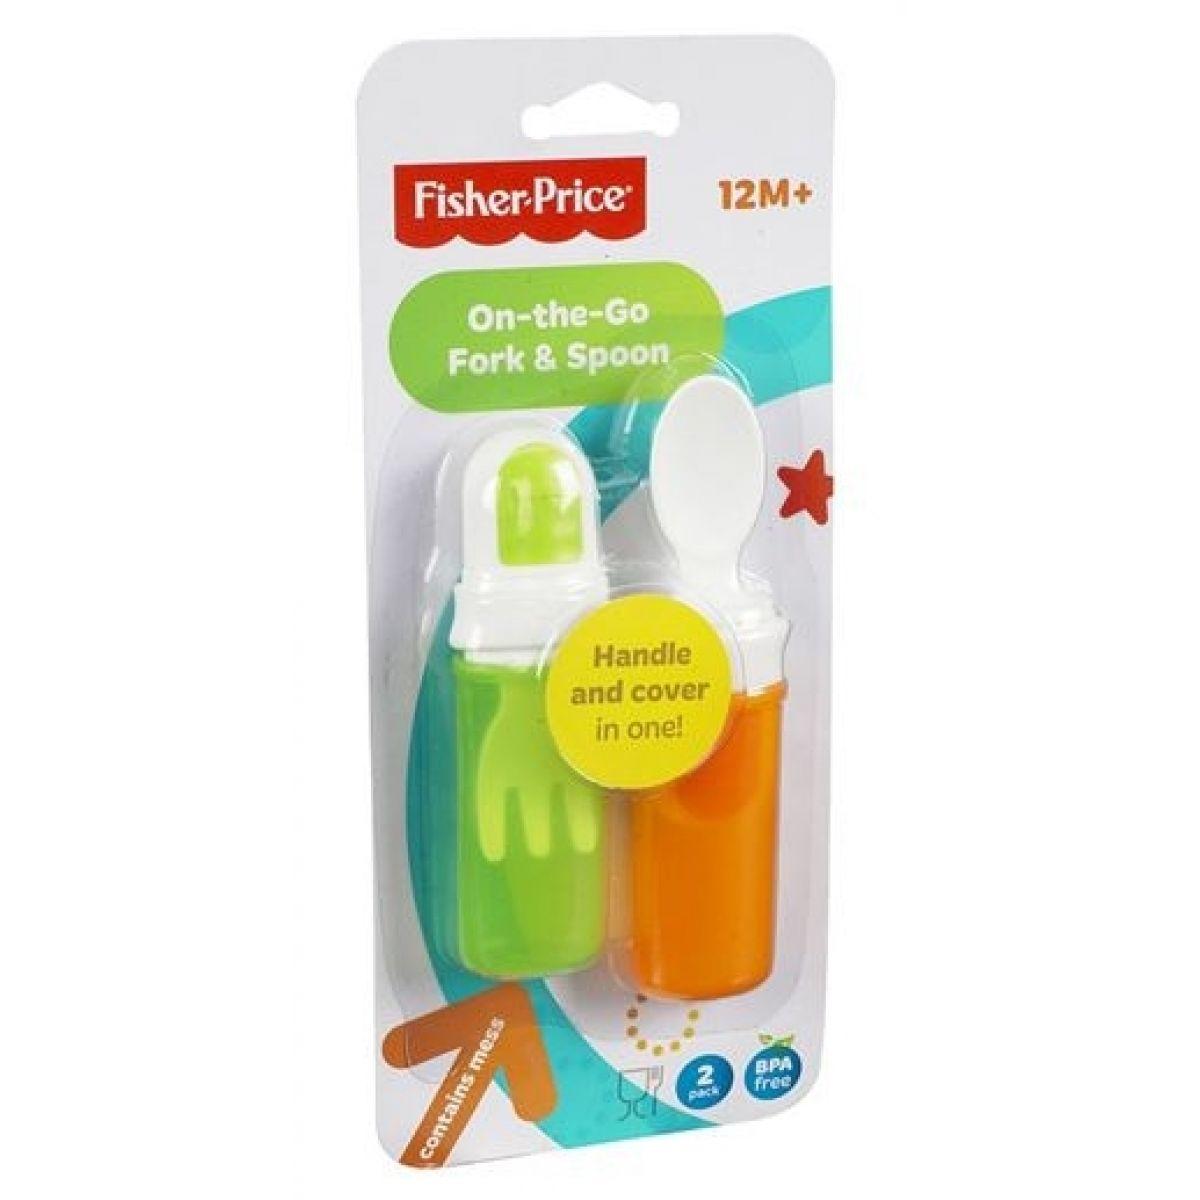 Fisher Price Cestovní lžička s vidličkou